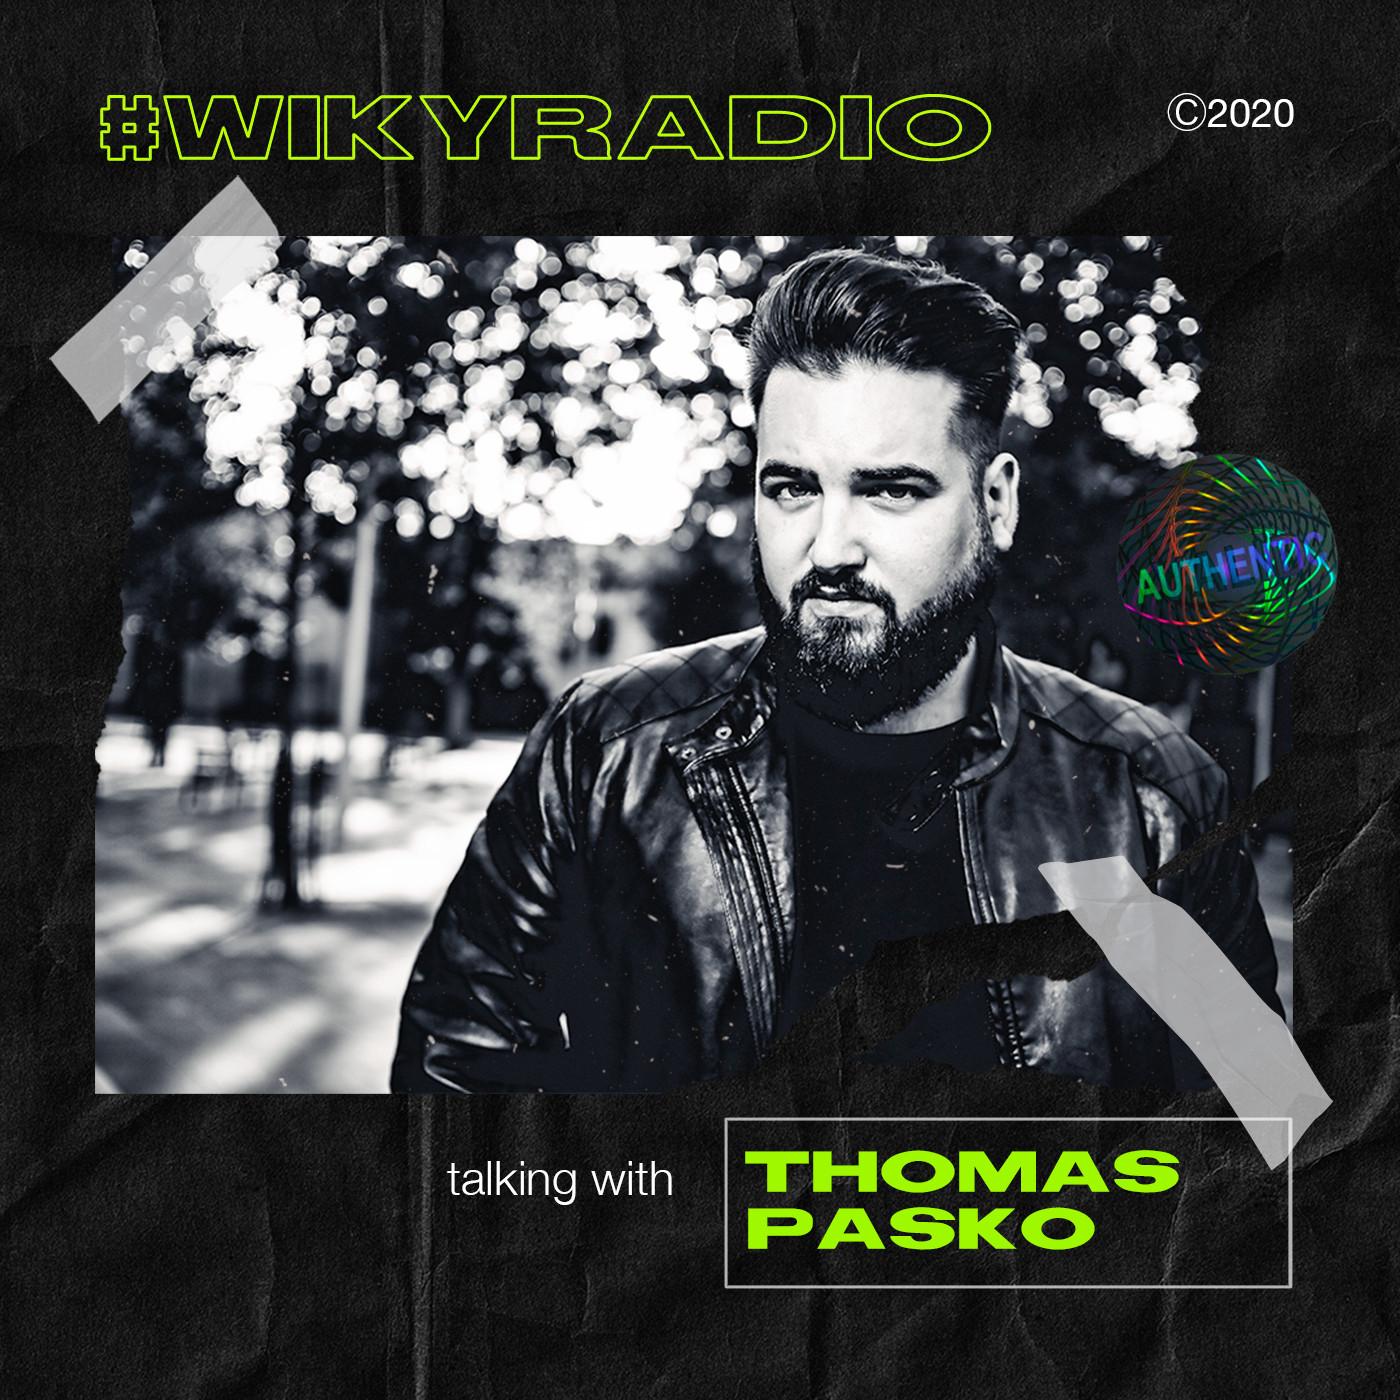 WIKY RADIO - TALKING WITH THOMAS PASKO